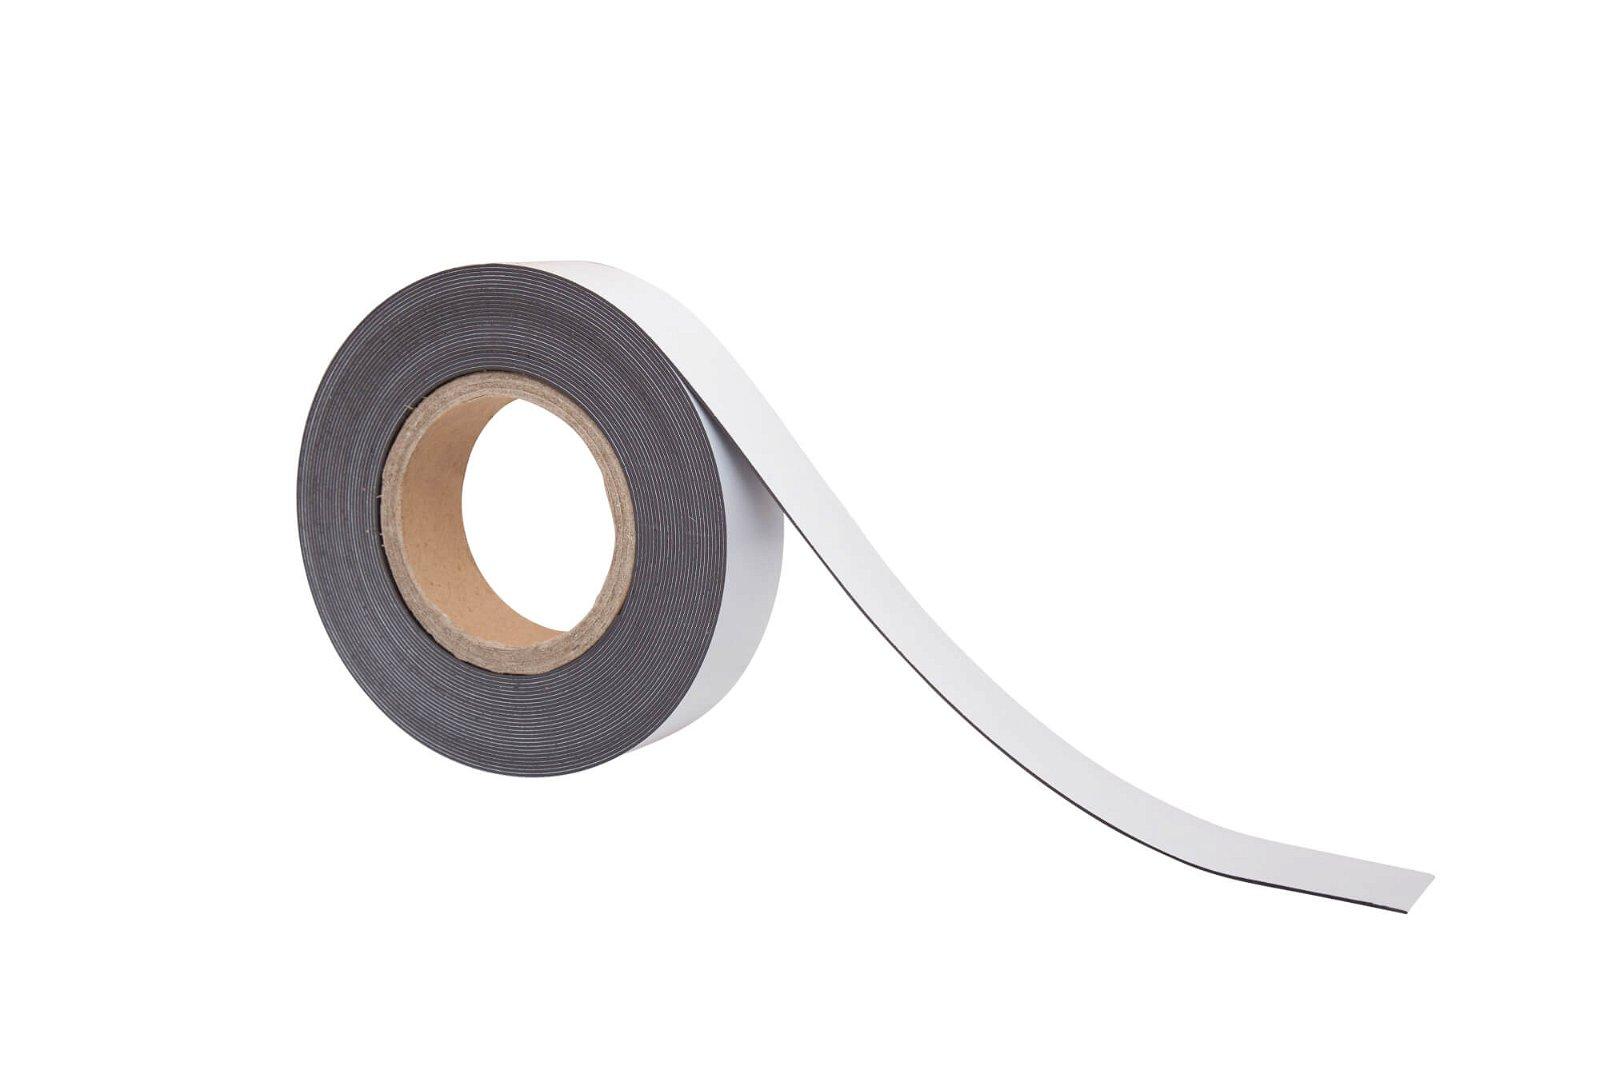 Magnetband selbstklebend, 10 m x 35 mm x 1 mm, sonstige